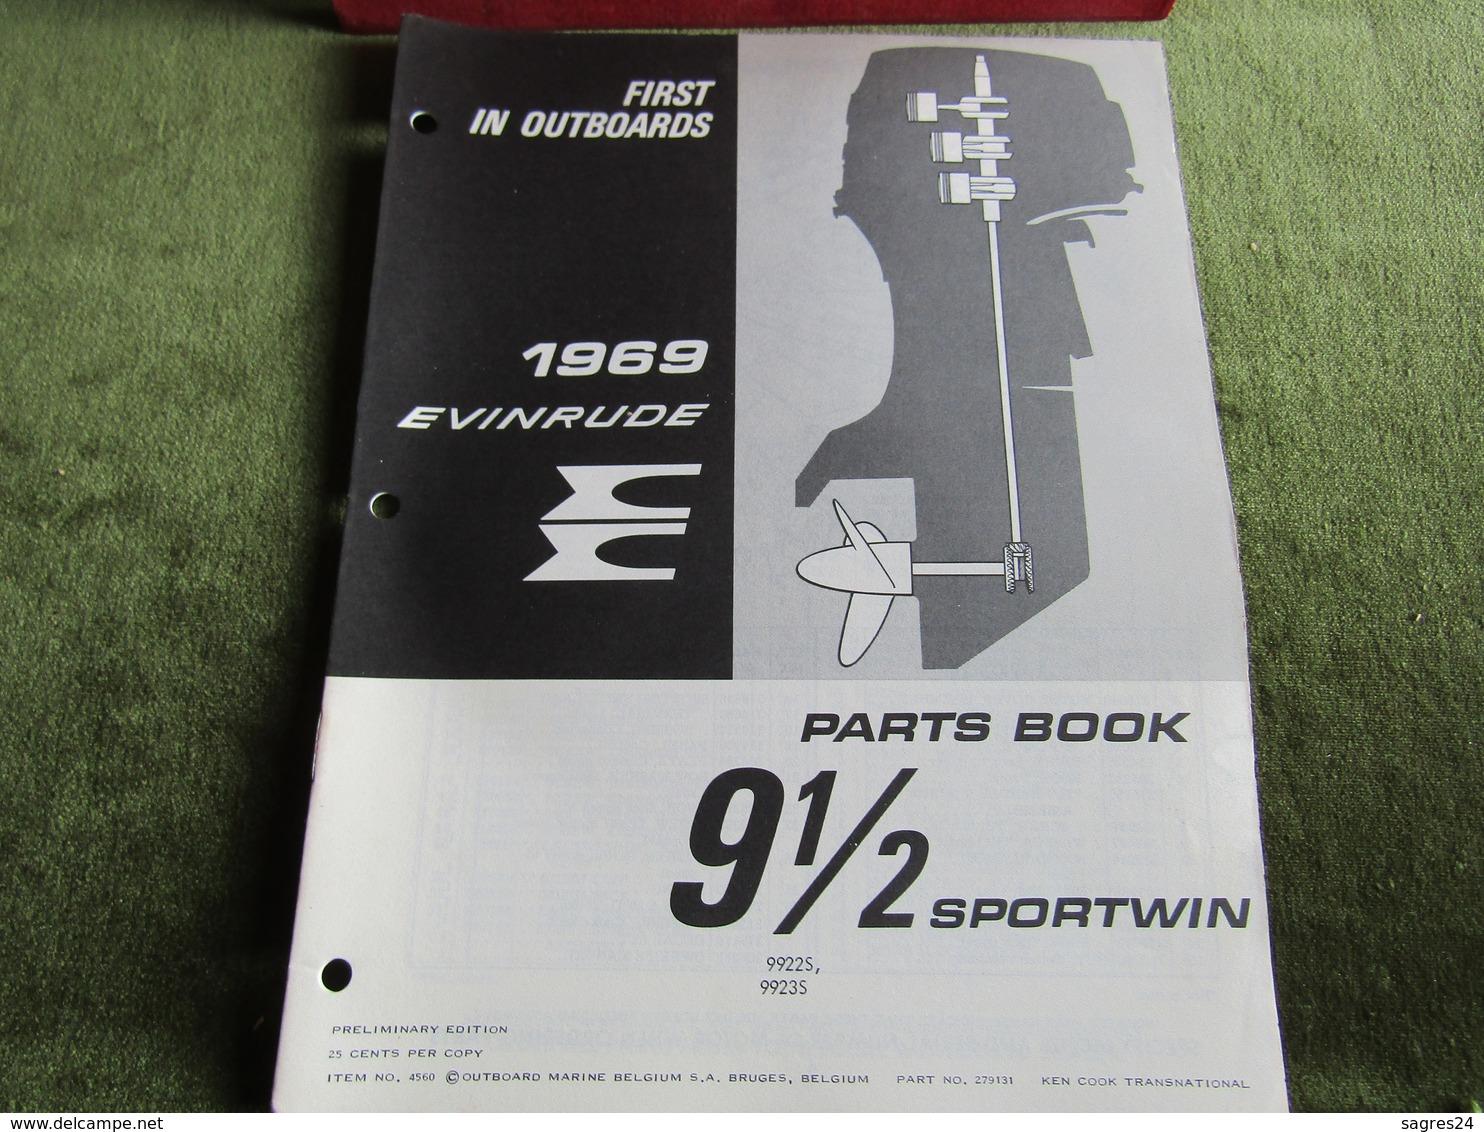 Evinrude Outboard 91/2 Sportwin Parts Book 1969 - Boats